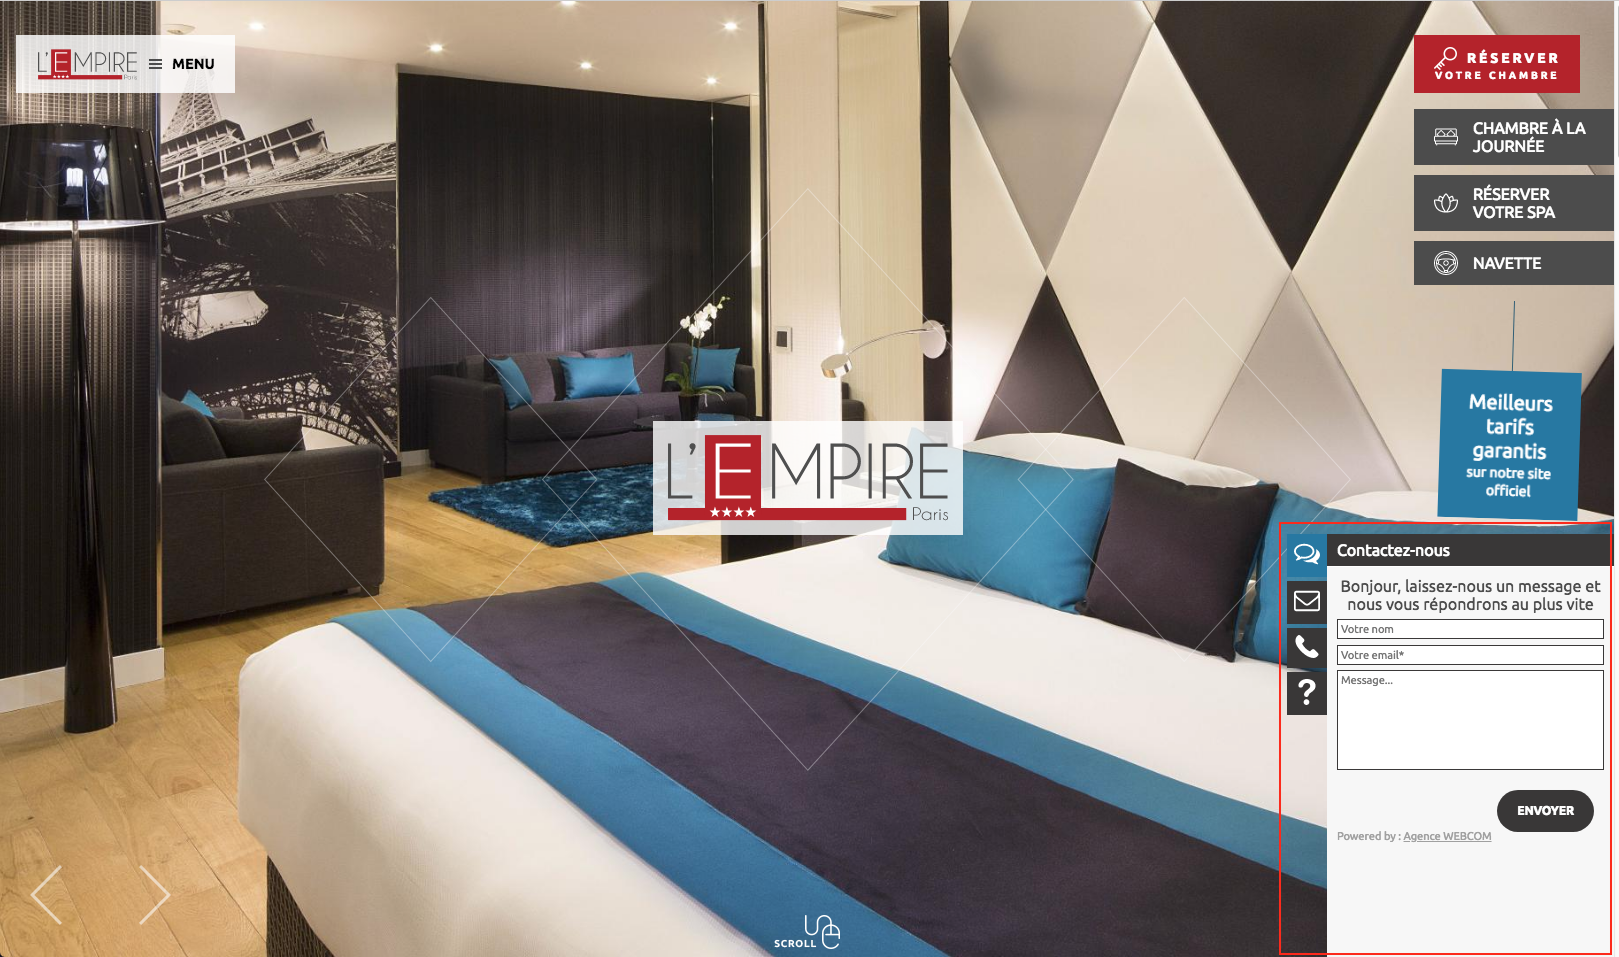 Hotel L'Empire Paris - Exemple de Chat Inactif